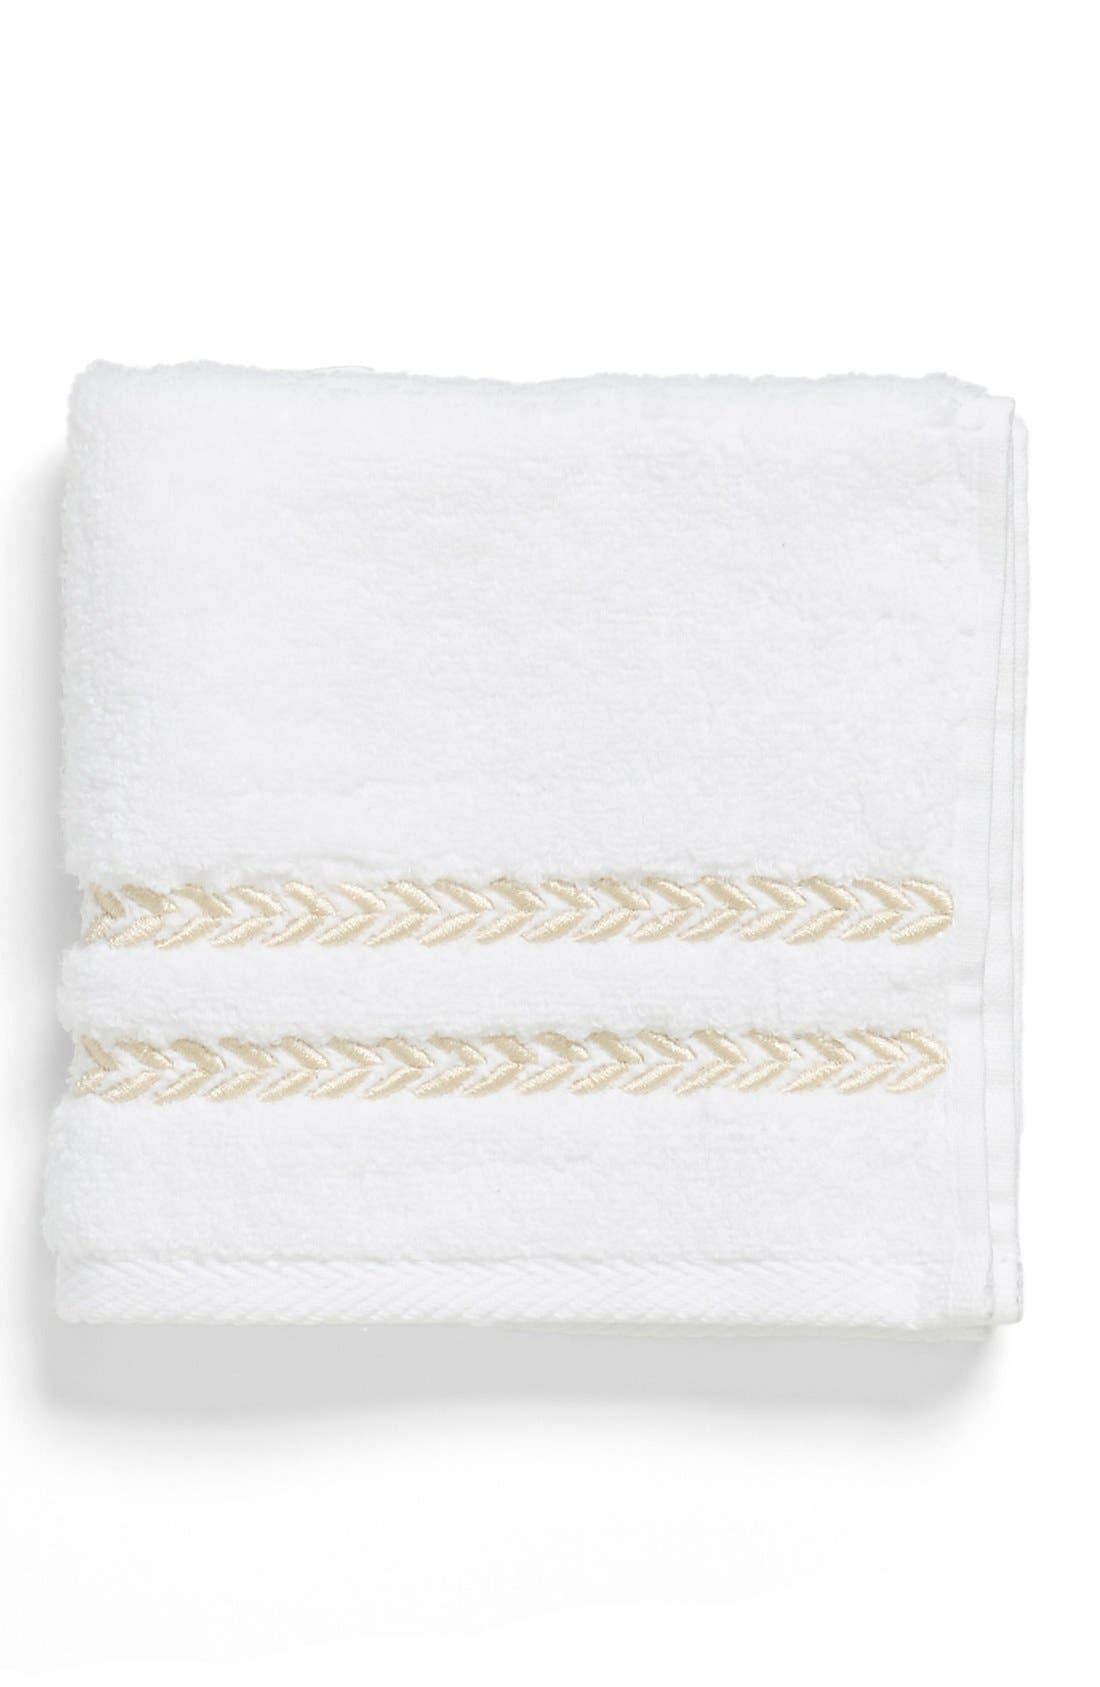 Alternate Image 1 Selected - Dena Home 'Pearl Essence' Wash Towel